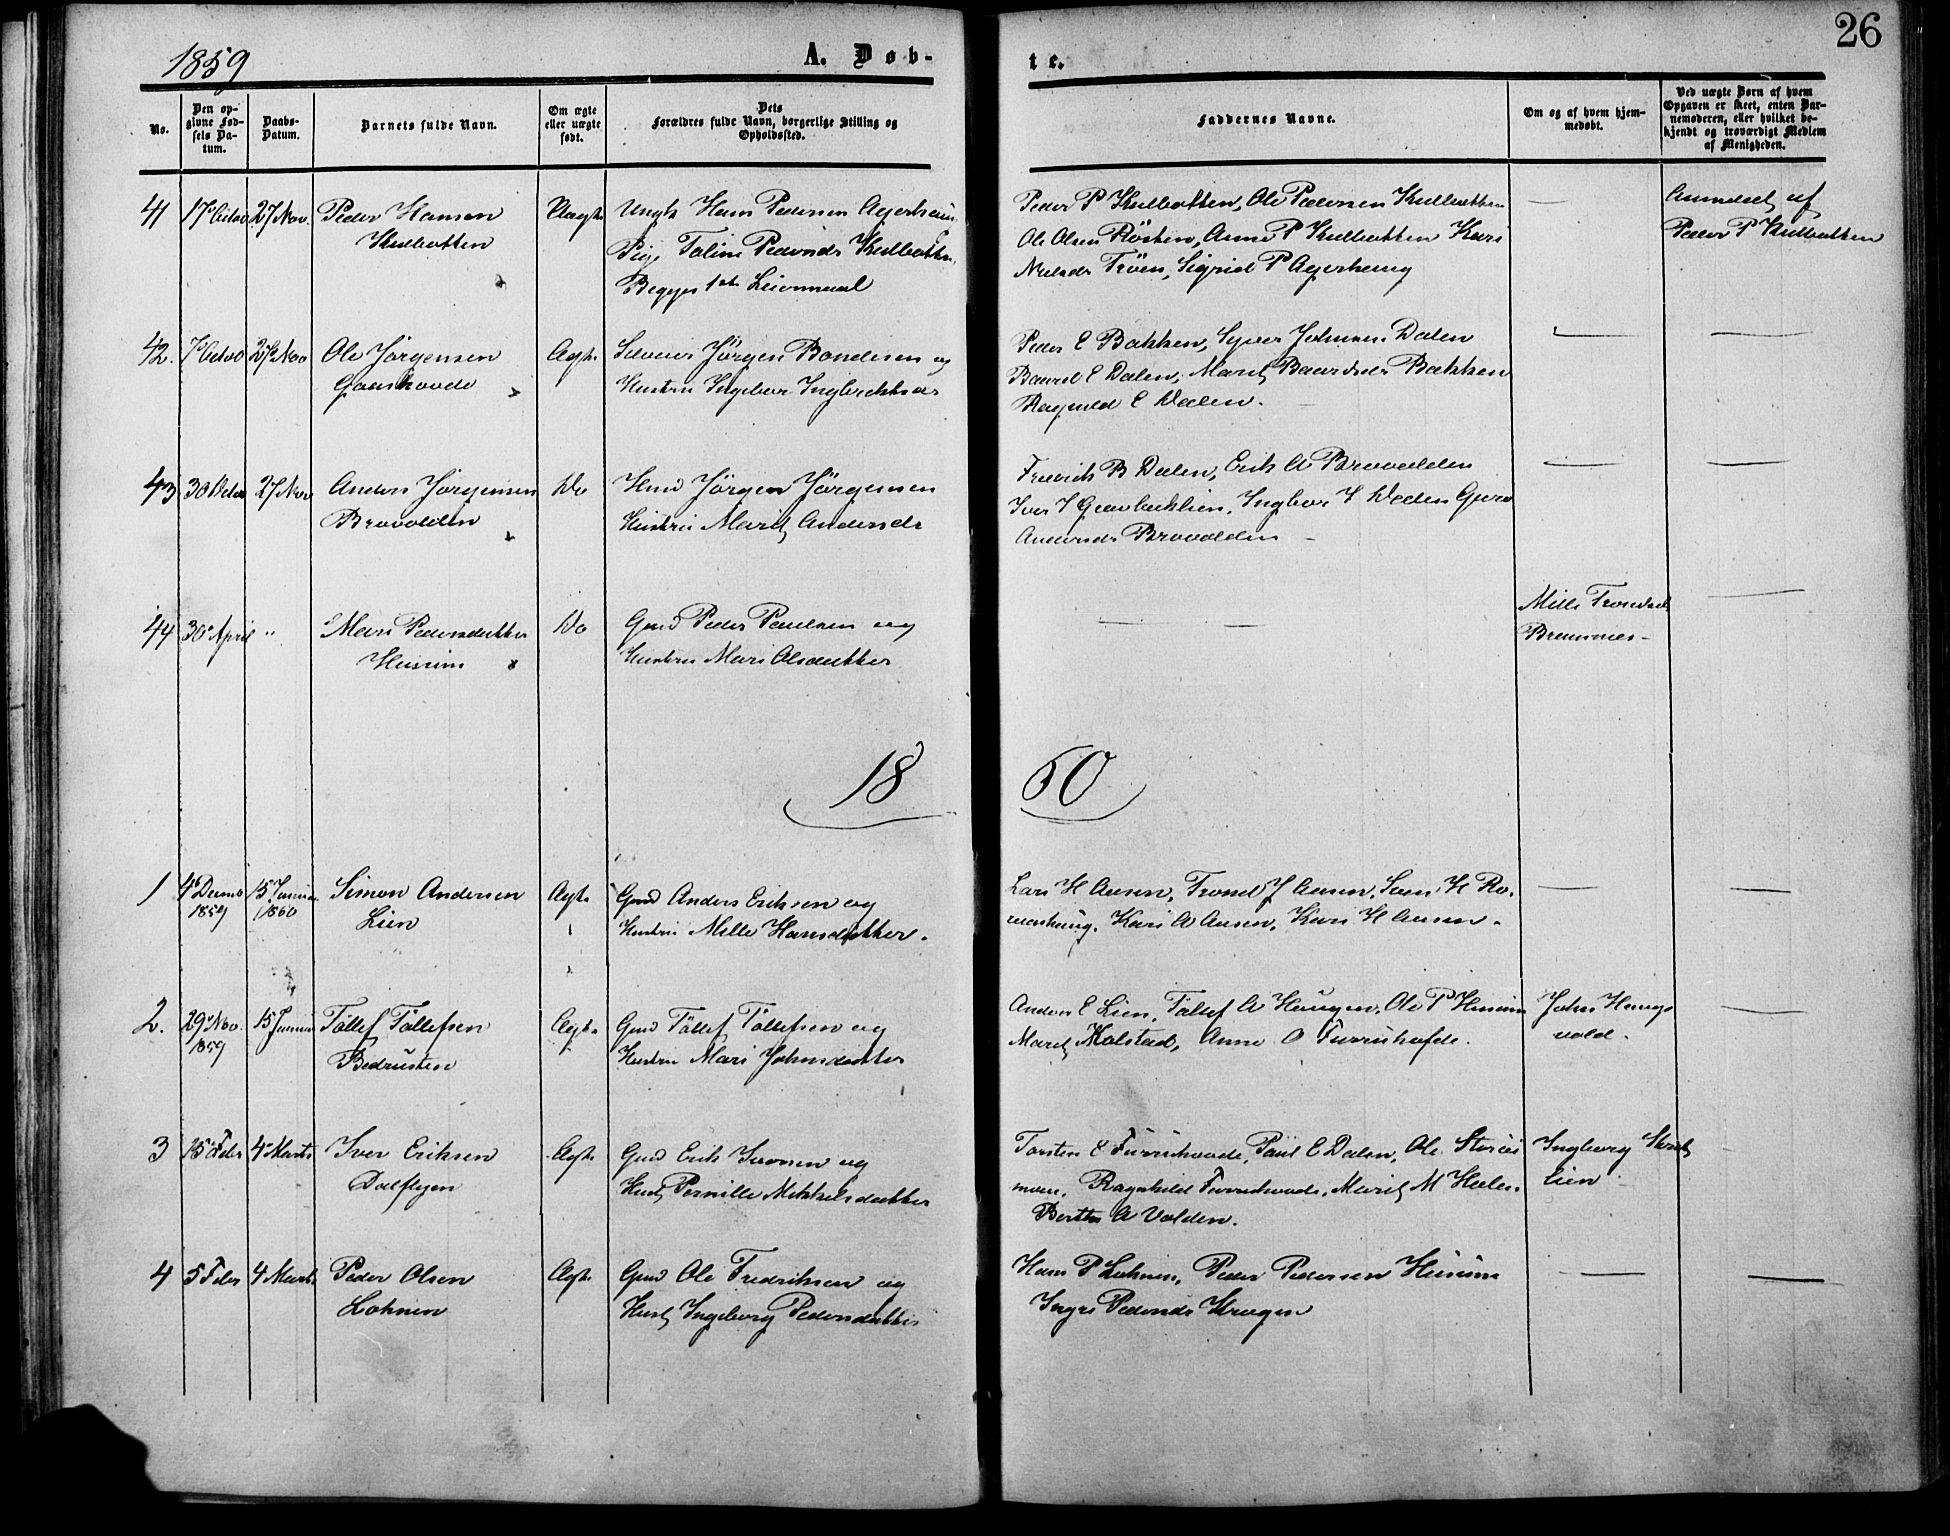 SAH, Lesja prestekontor, Ministerialbok nr. 7, 1854-1862, s. 26